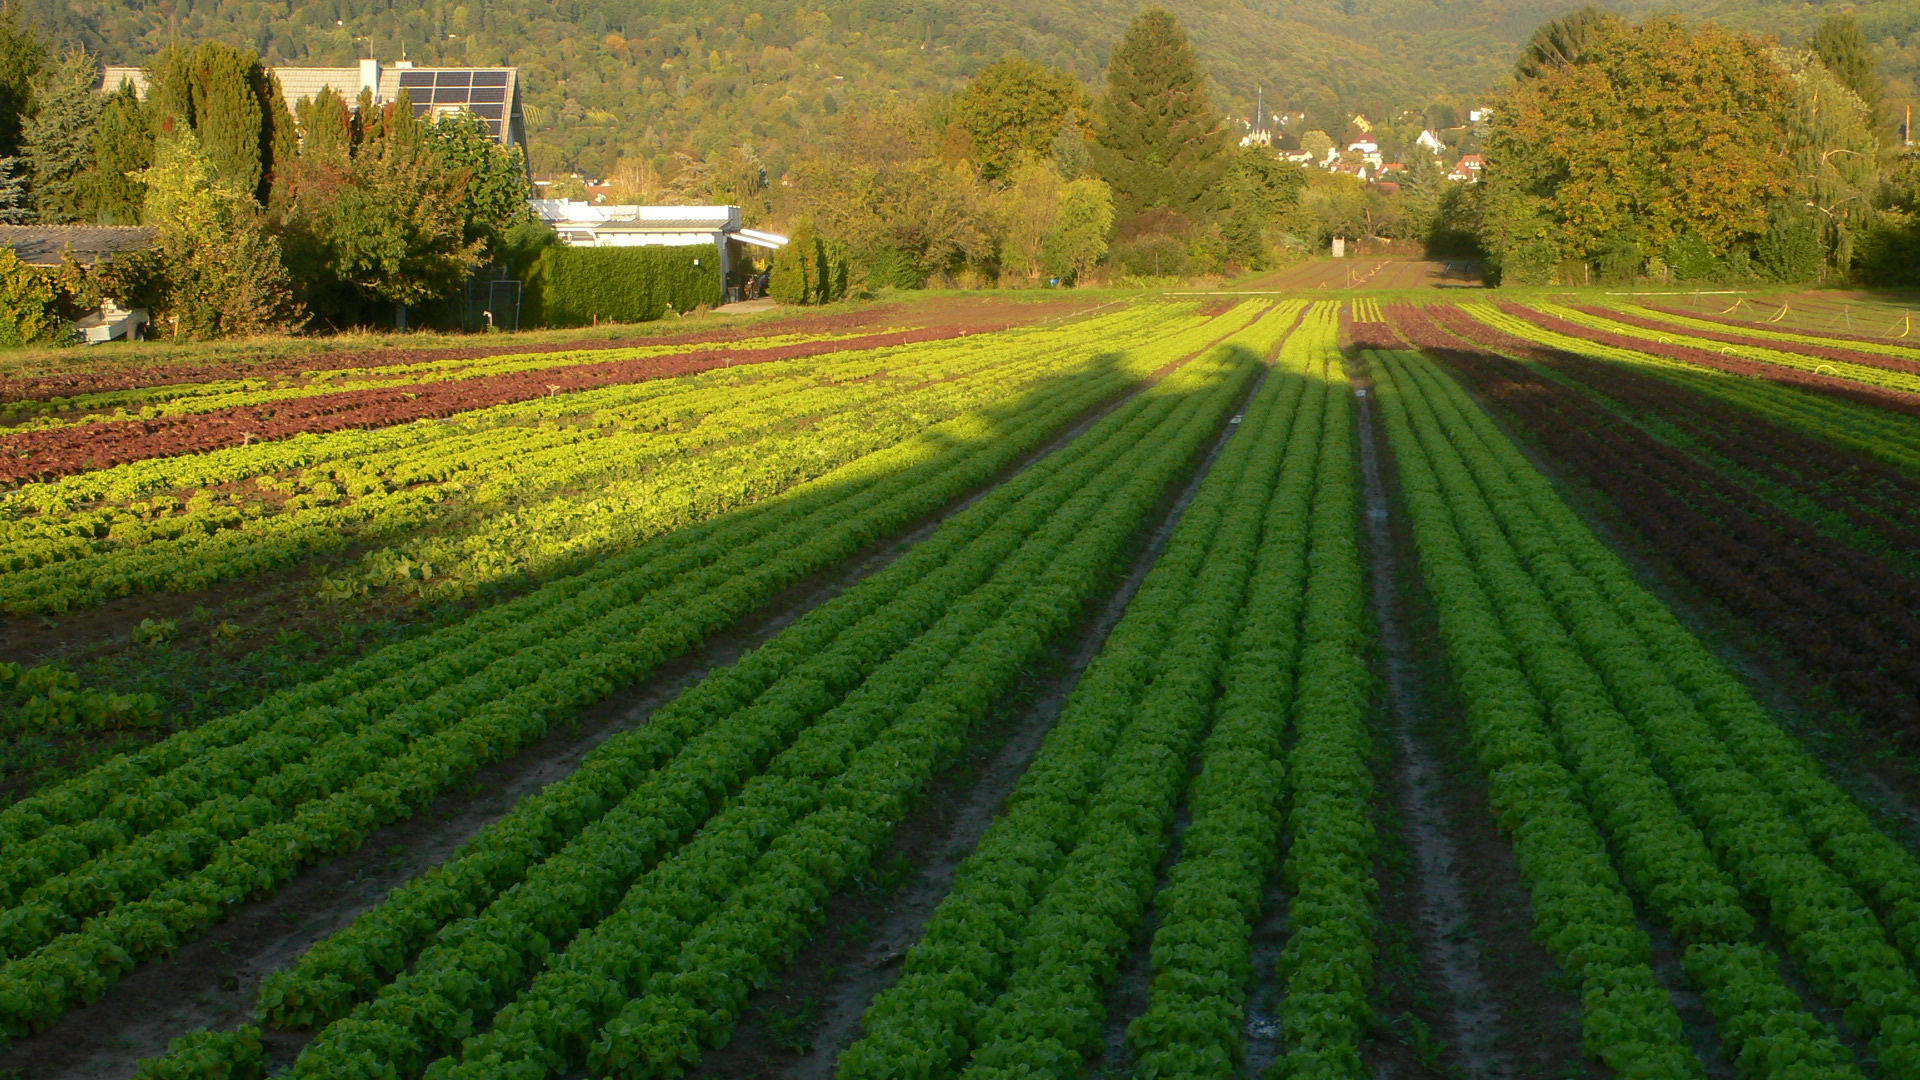 Salat im Handschuhsheimer Feld in vielen Varietäten